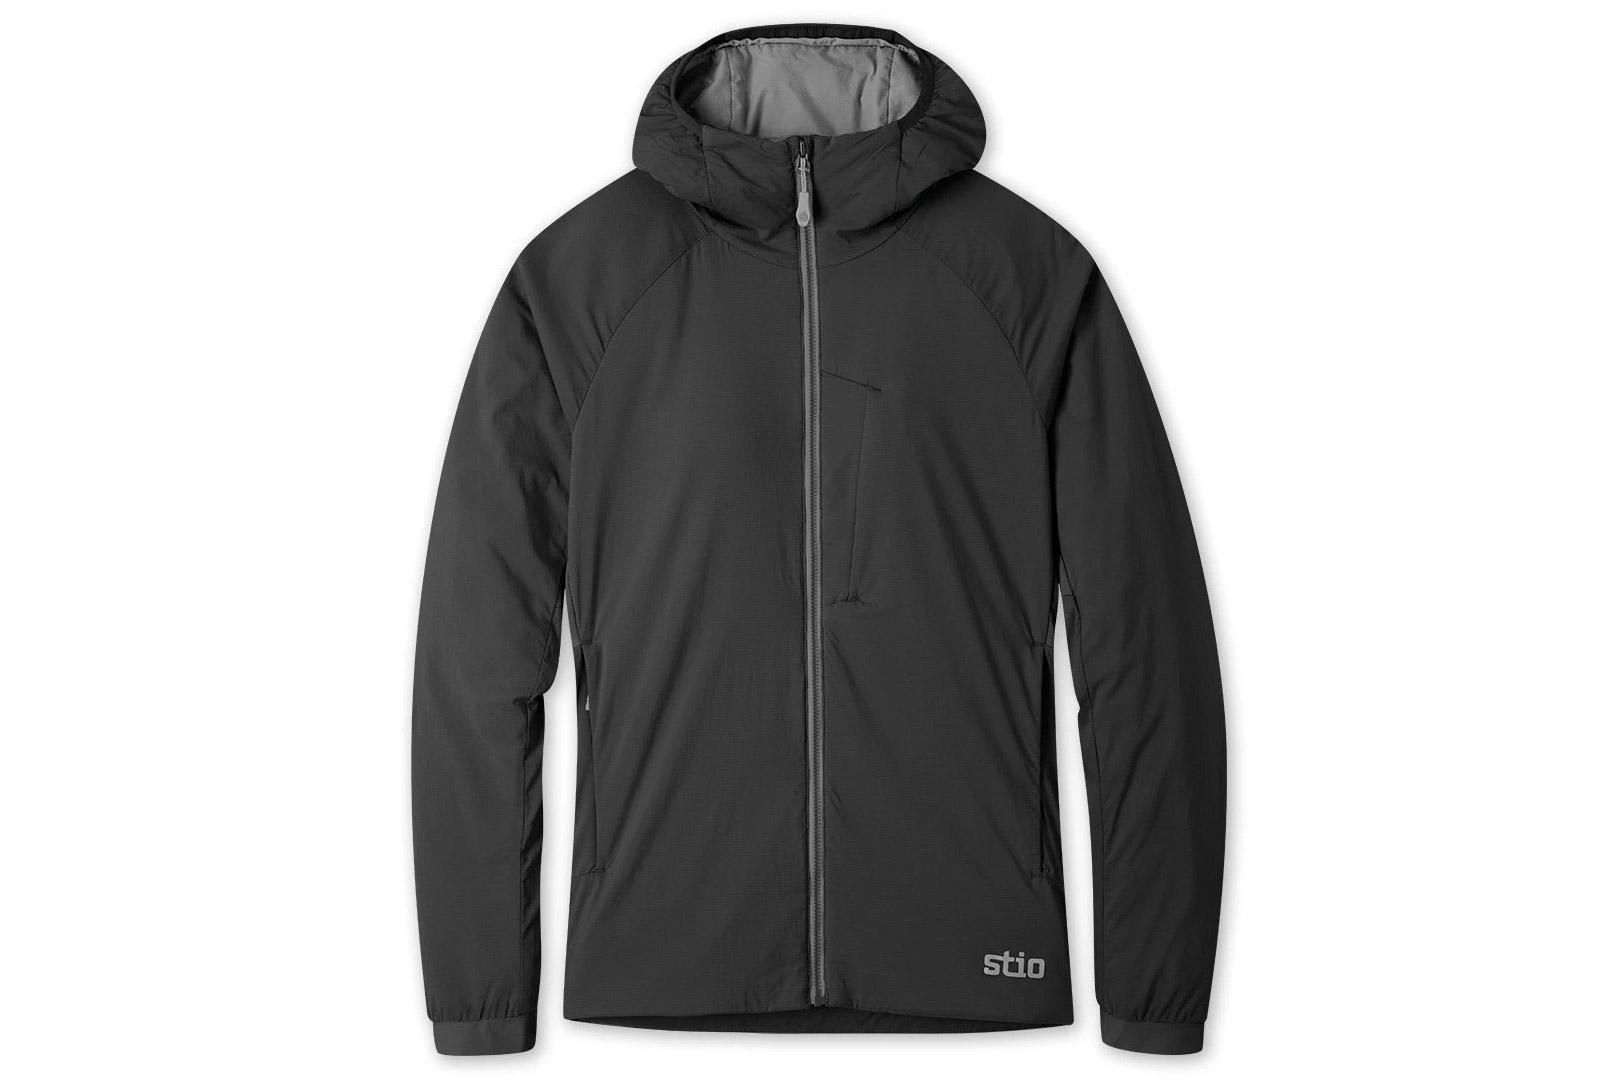 stio alpiner hooded jacket